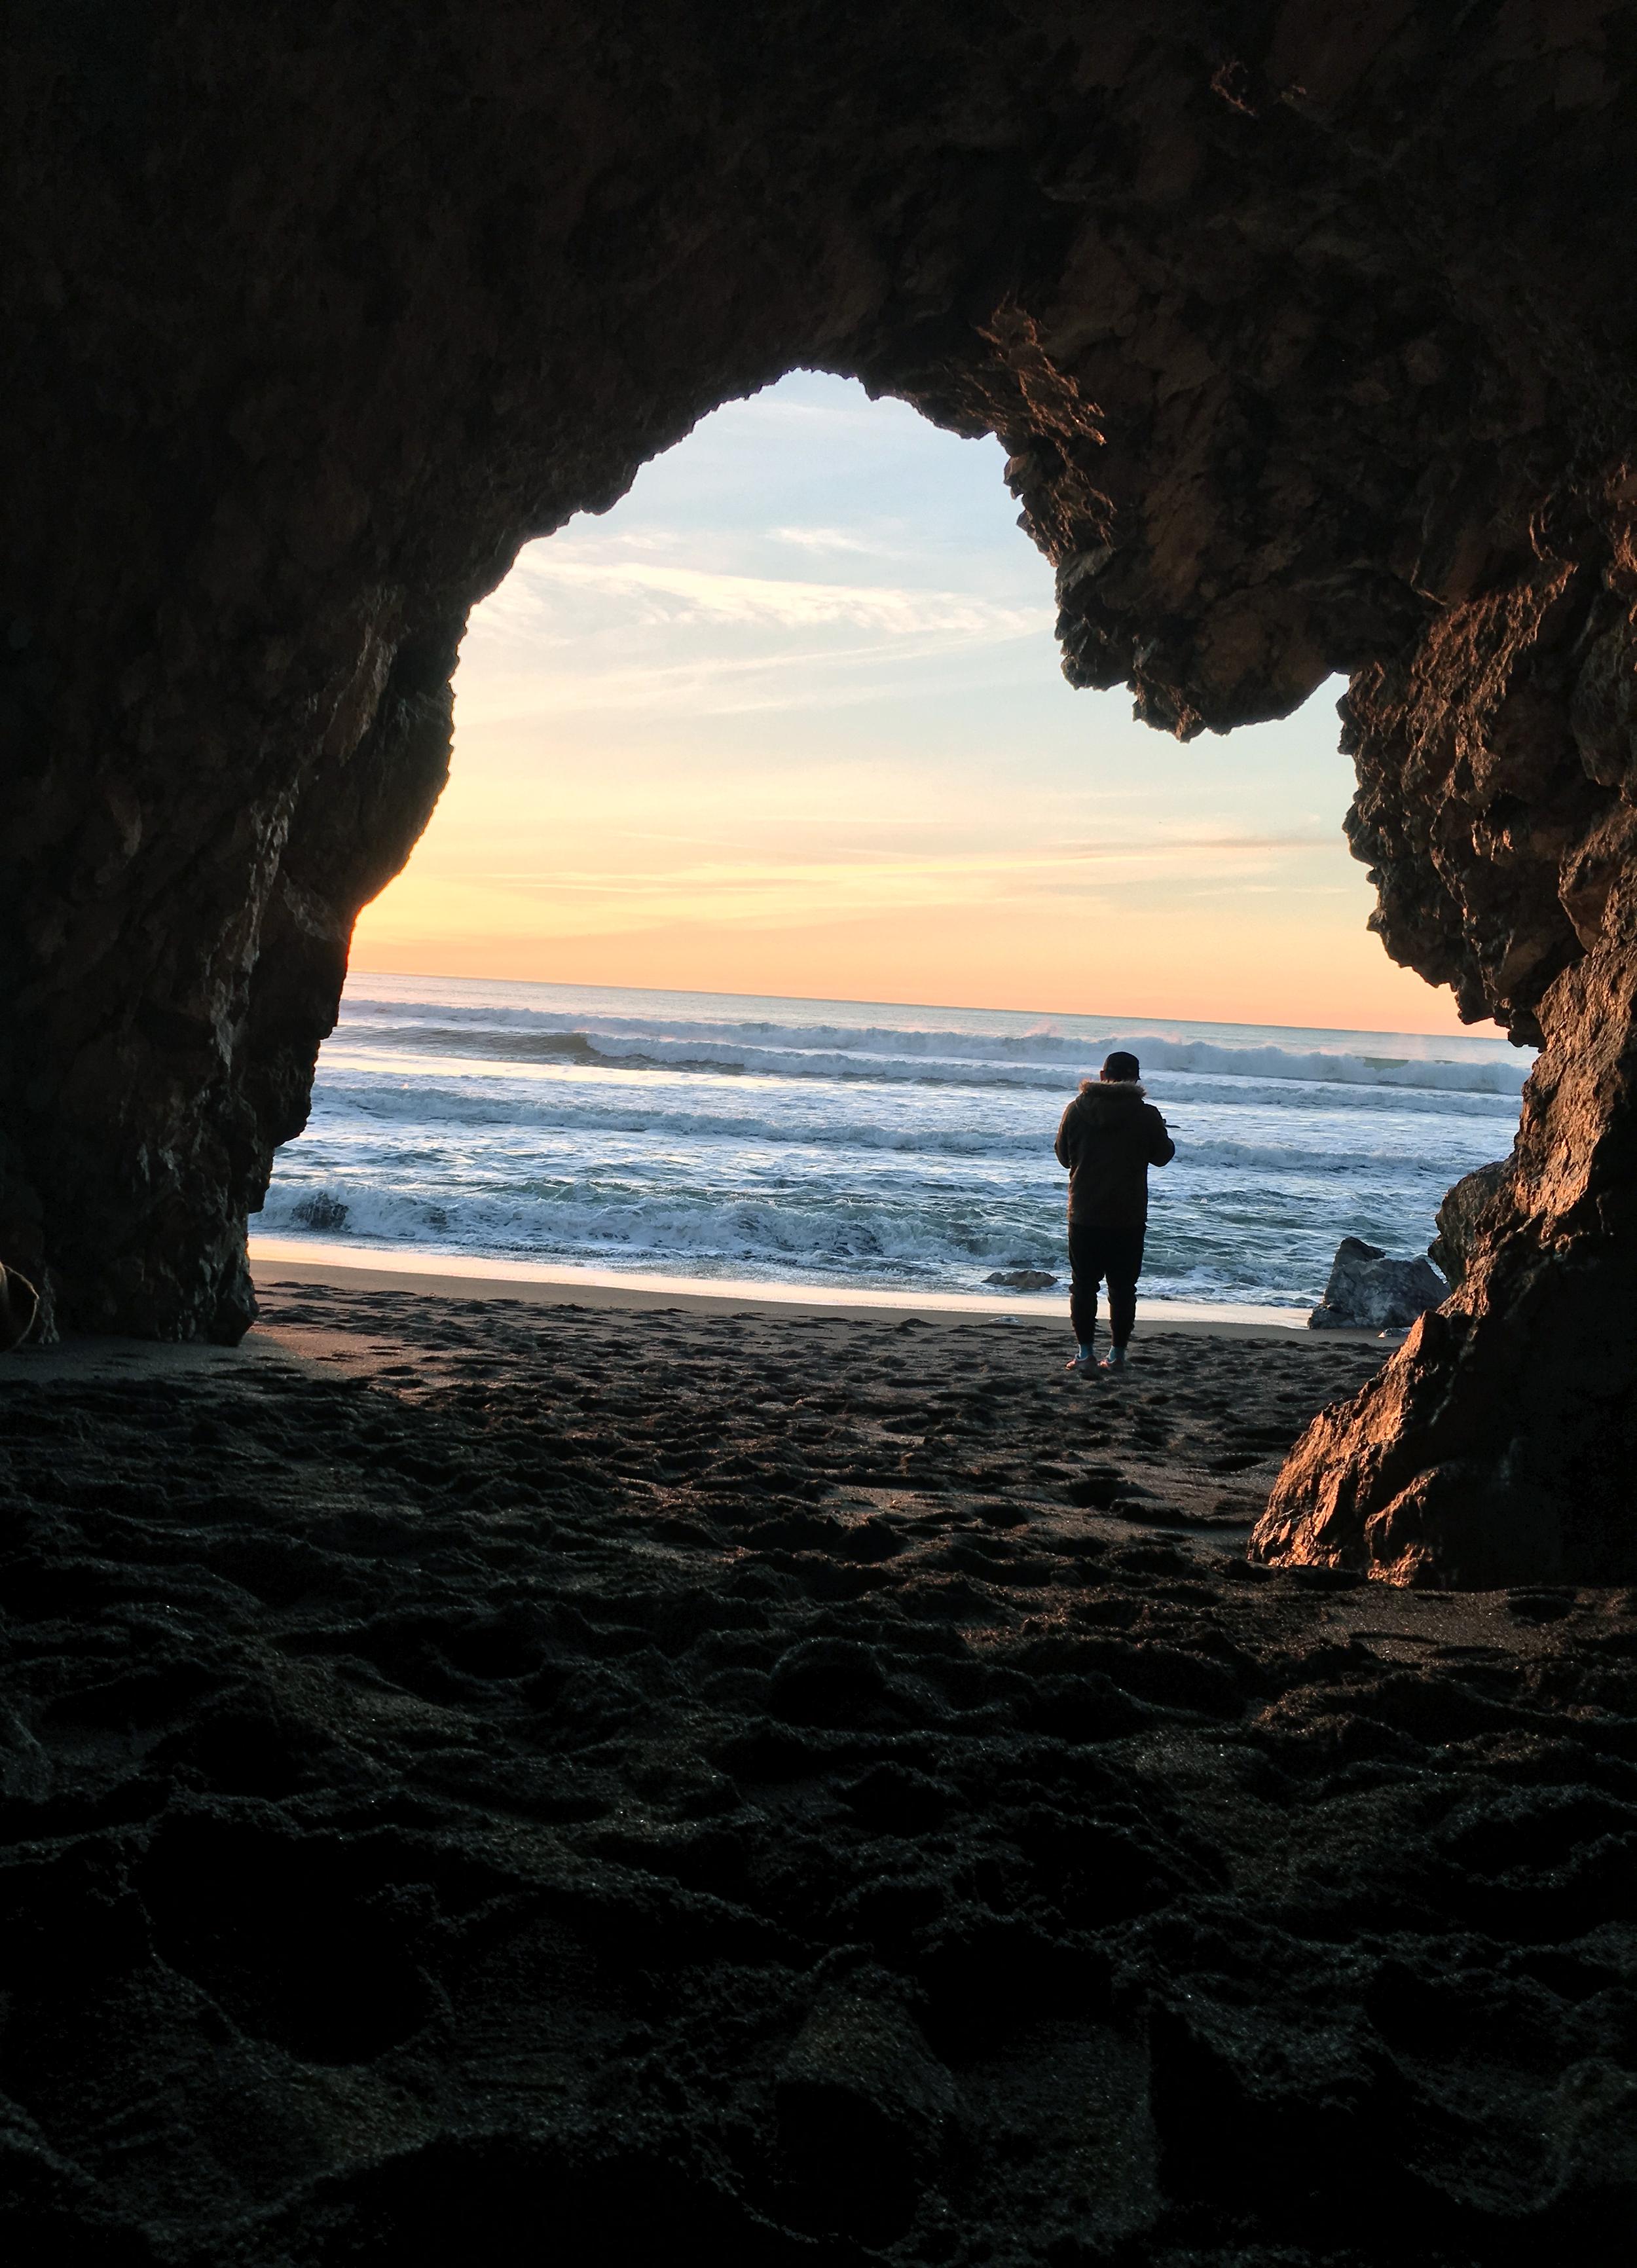 pacifica-kris-hoangmnguyen-hobolife-explore-caleravalley